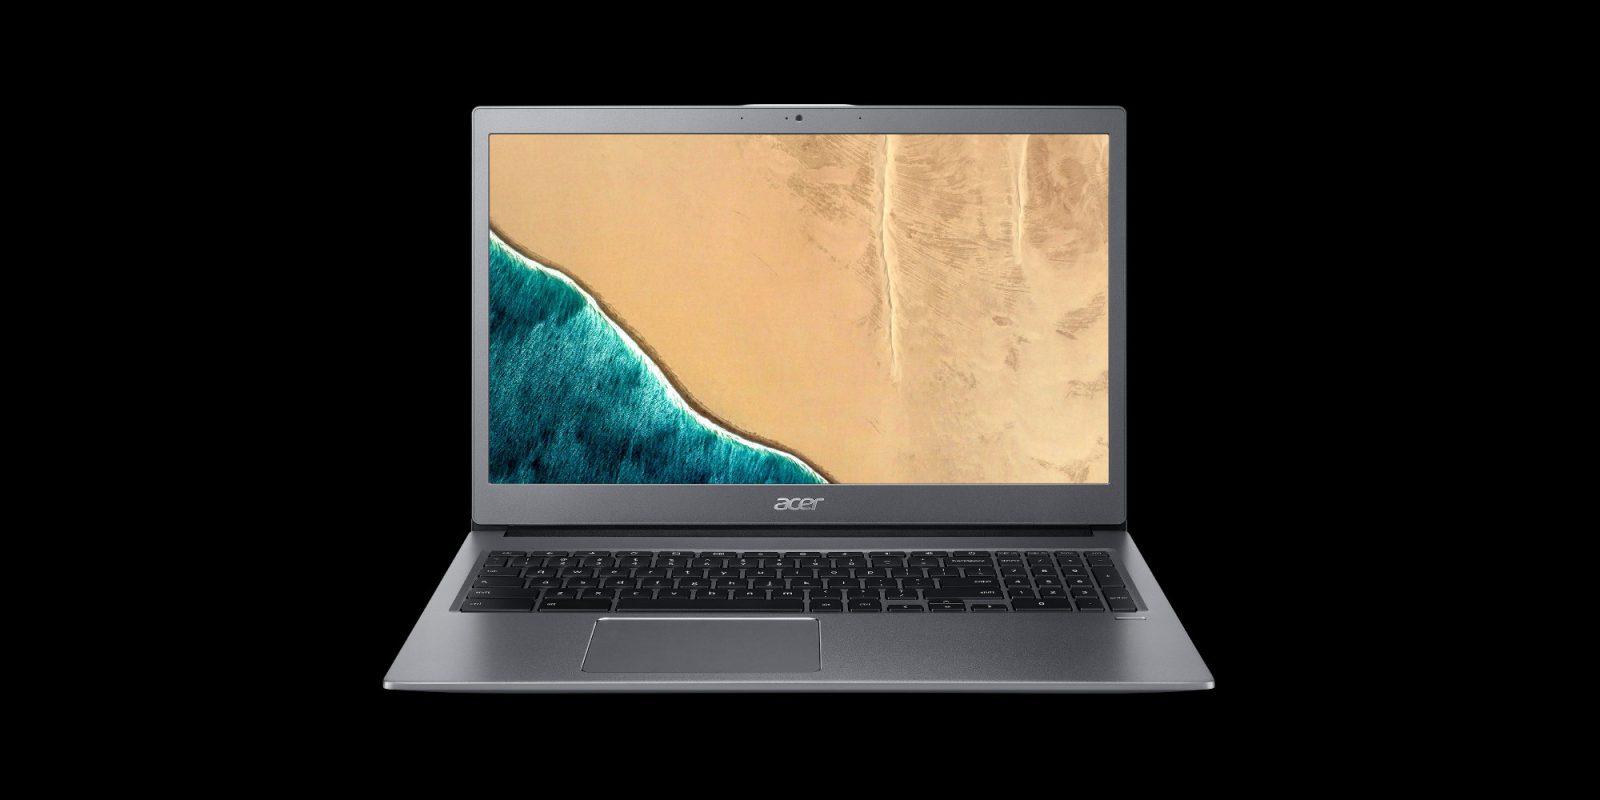 Acer's all-aluminum 15-inch Chromebook has 128GB of storage: $299 (Reg. $379)